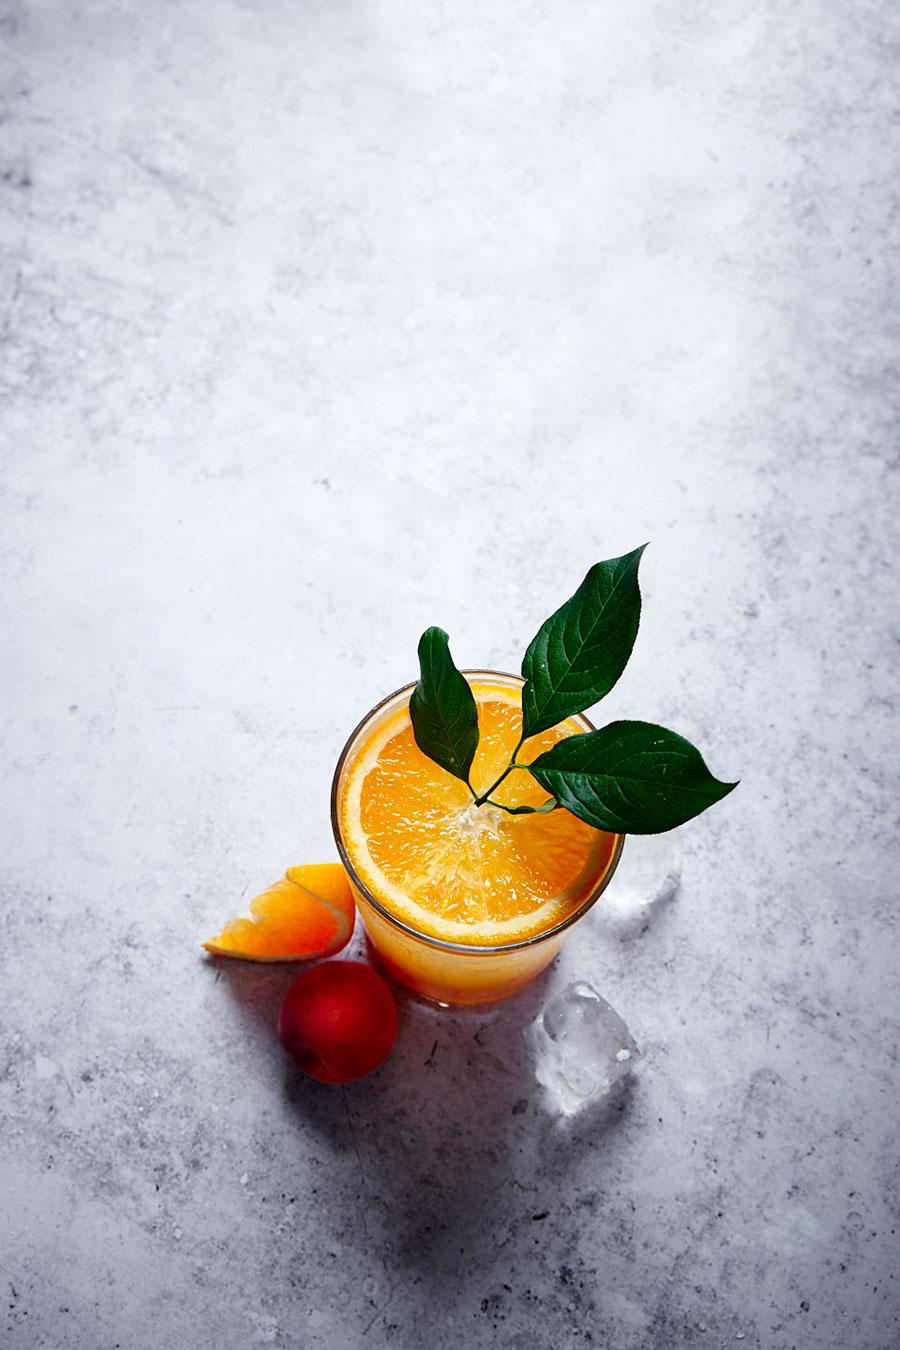 foodfotografie-rezept-drink-aprikosen-limonade